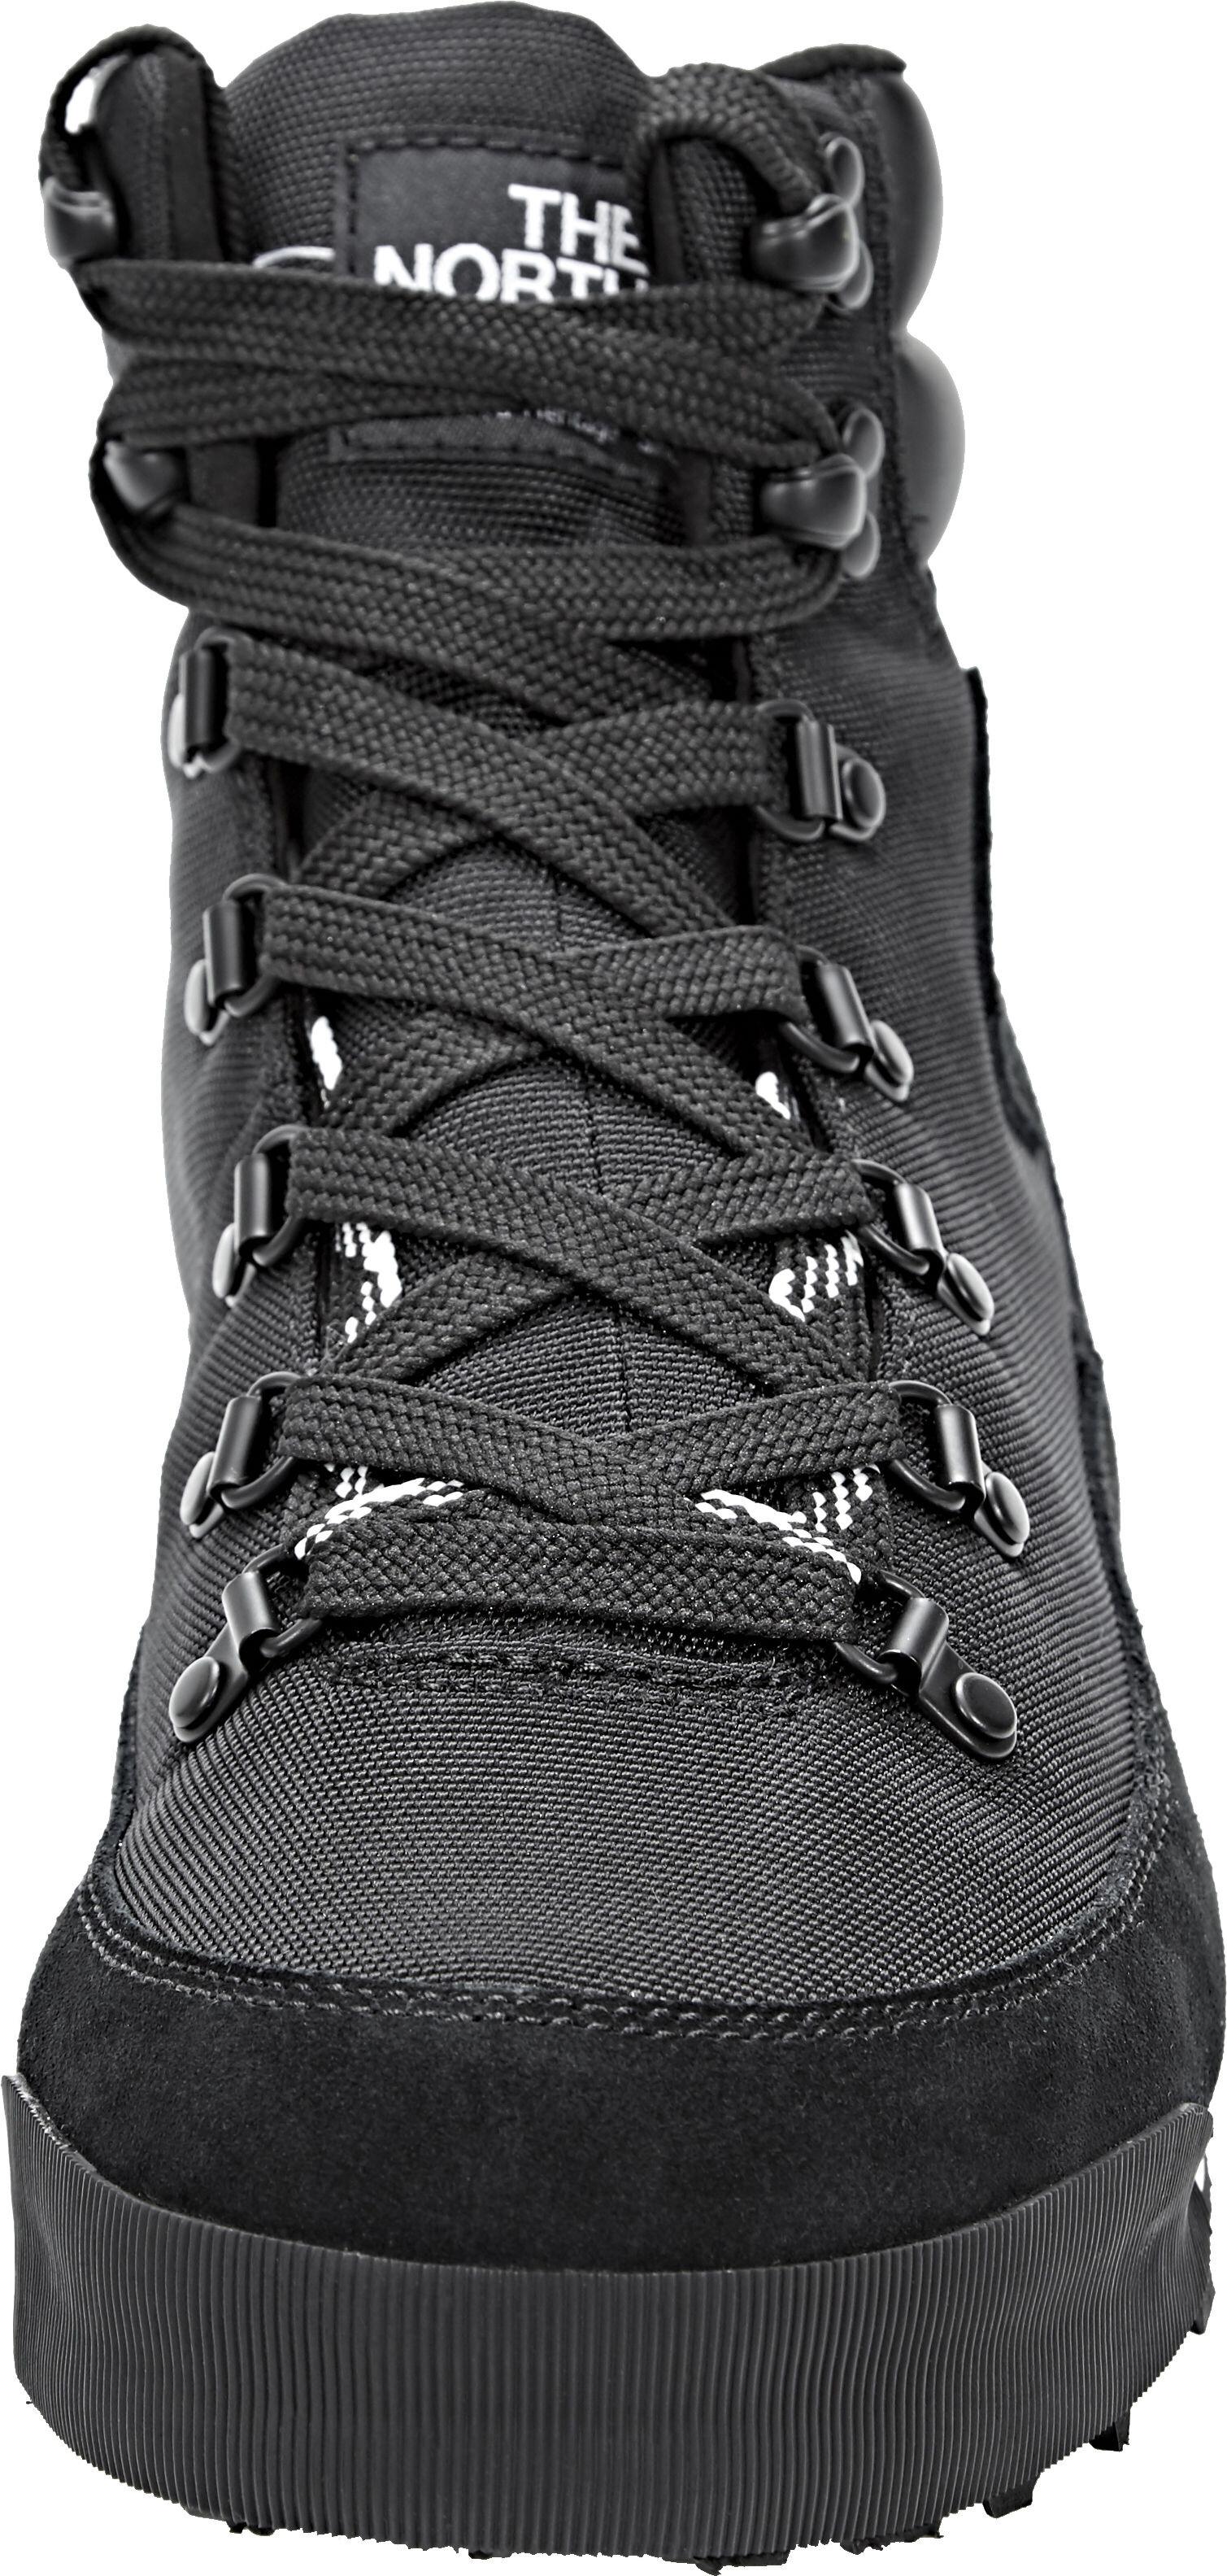 2b7321833efa49 The North Face Back-To-Berkeley NL Shoes Men TNF Black TNF White ...